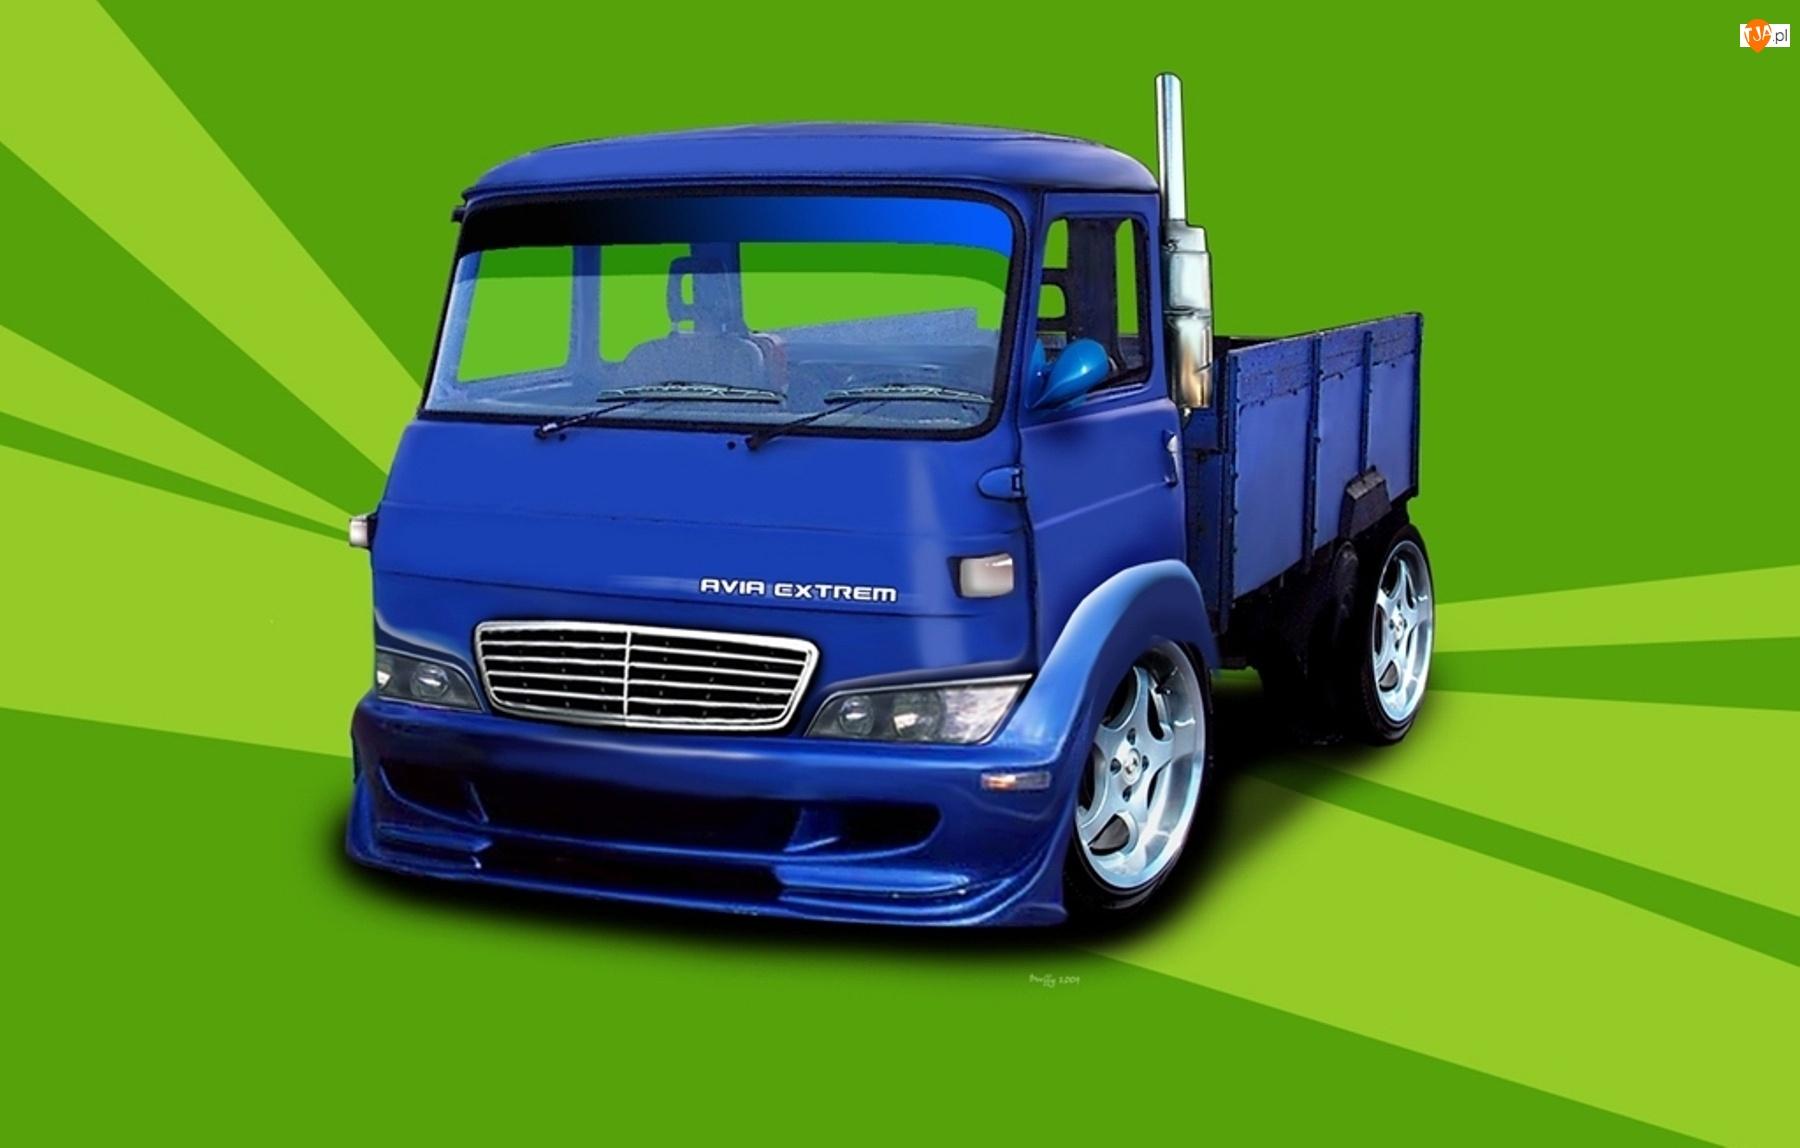 Ciężarówka, Grafika, Avia, Paka